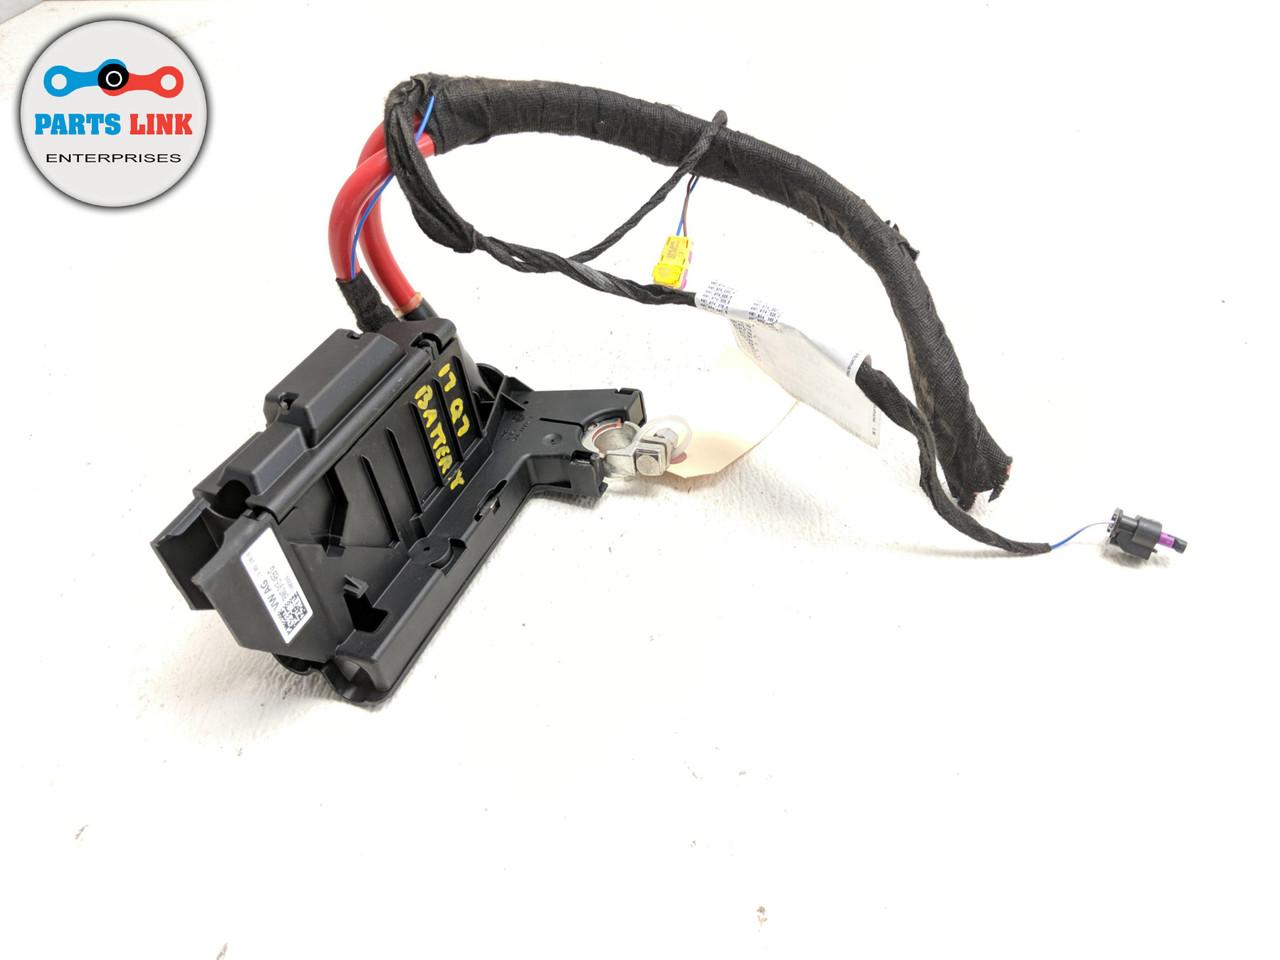 2017-2019 AUDI Q7 4M BATTERY FUSE BOX RELAY CONTROL MODULE CABLE TERMINAL  OEM - PARTS LINK ENT   Audi Battery Fuse Box      Parts Link Enterprise